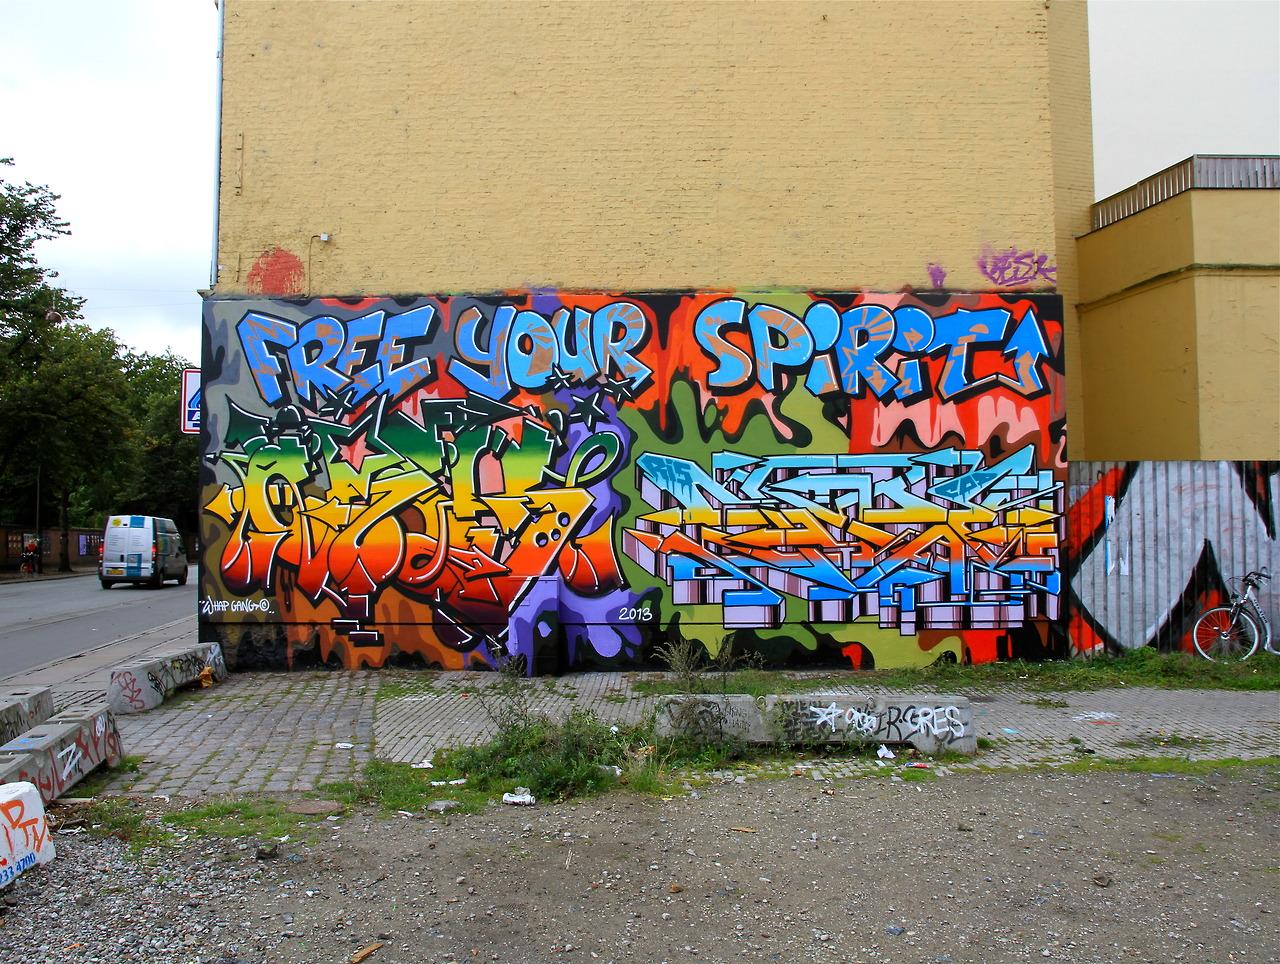 Cres_Sabe_Whap_FYS_Graffiti_Denmark_1